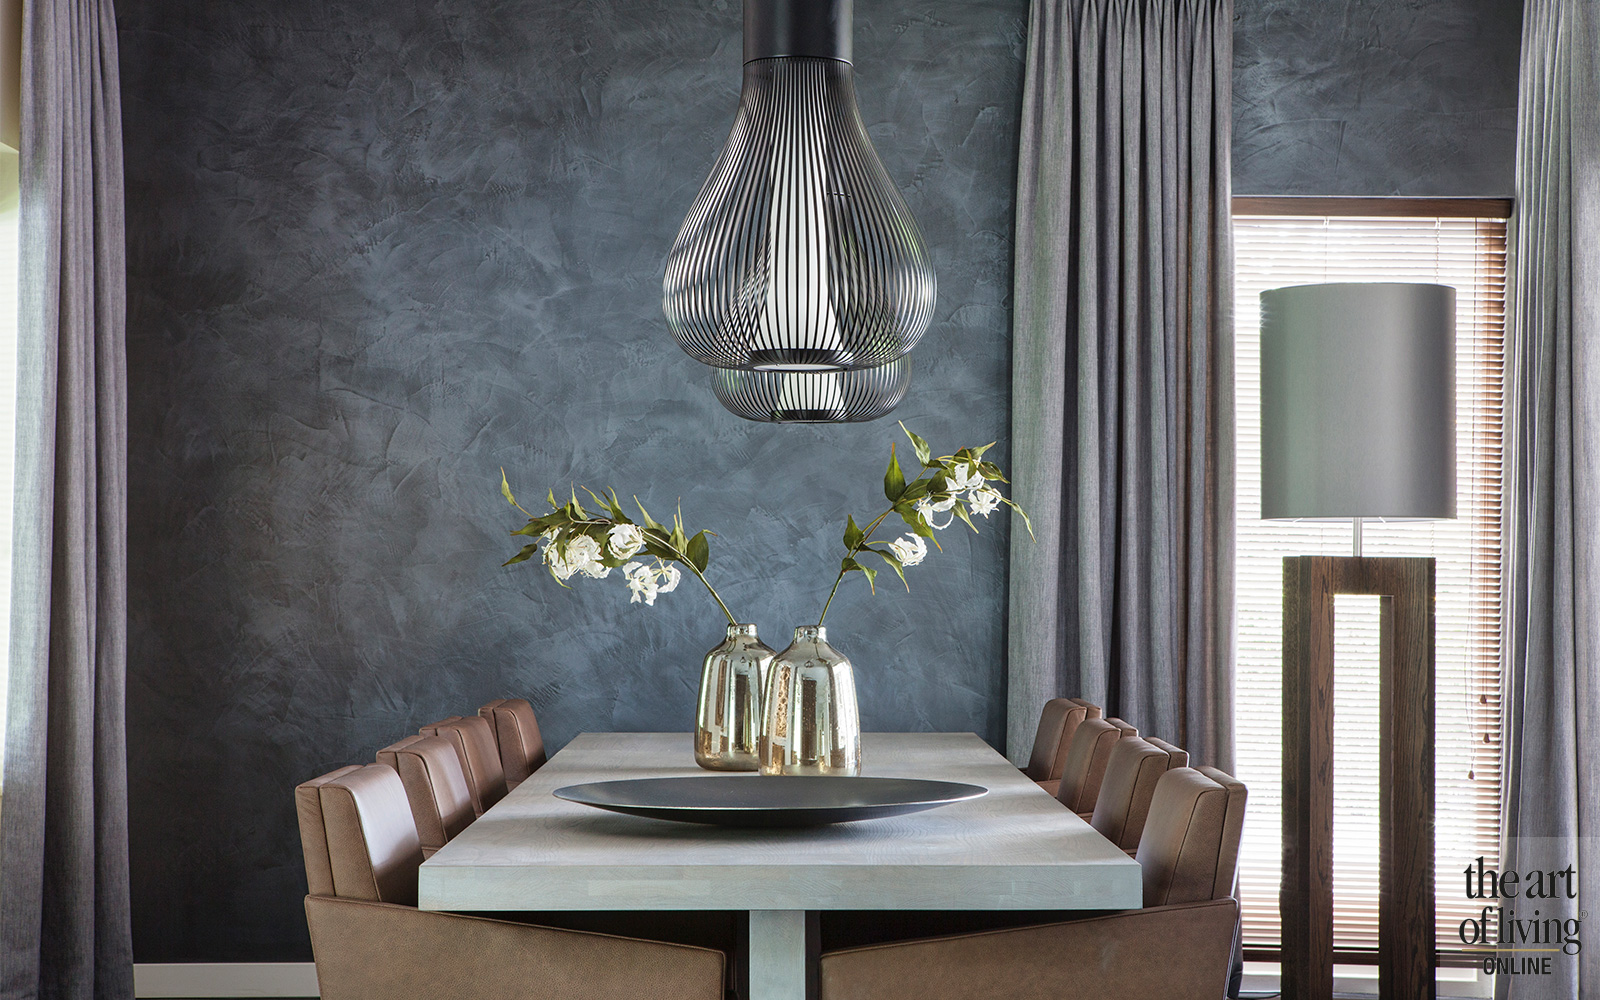 warmte en intimiteit, Remy Meijers, interieurdesign